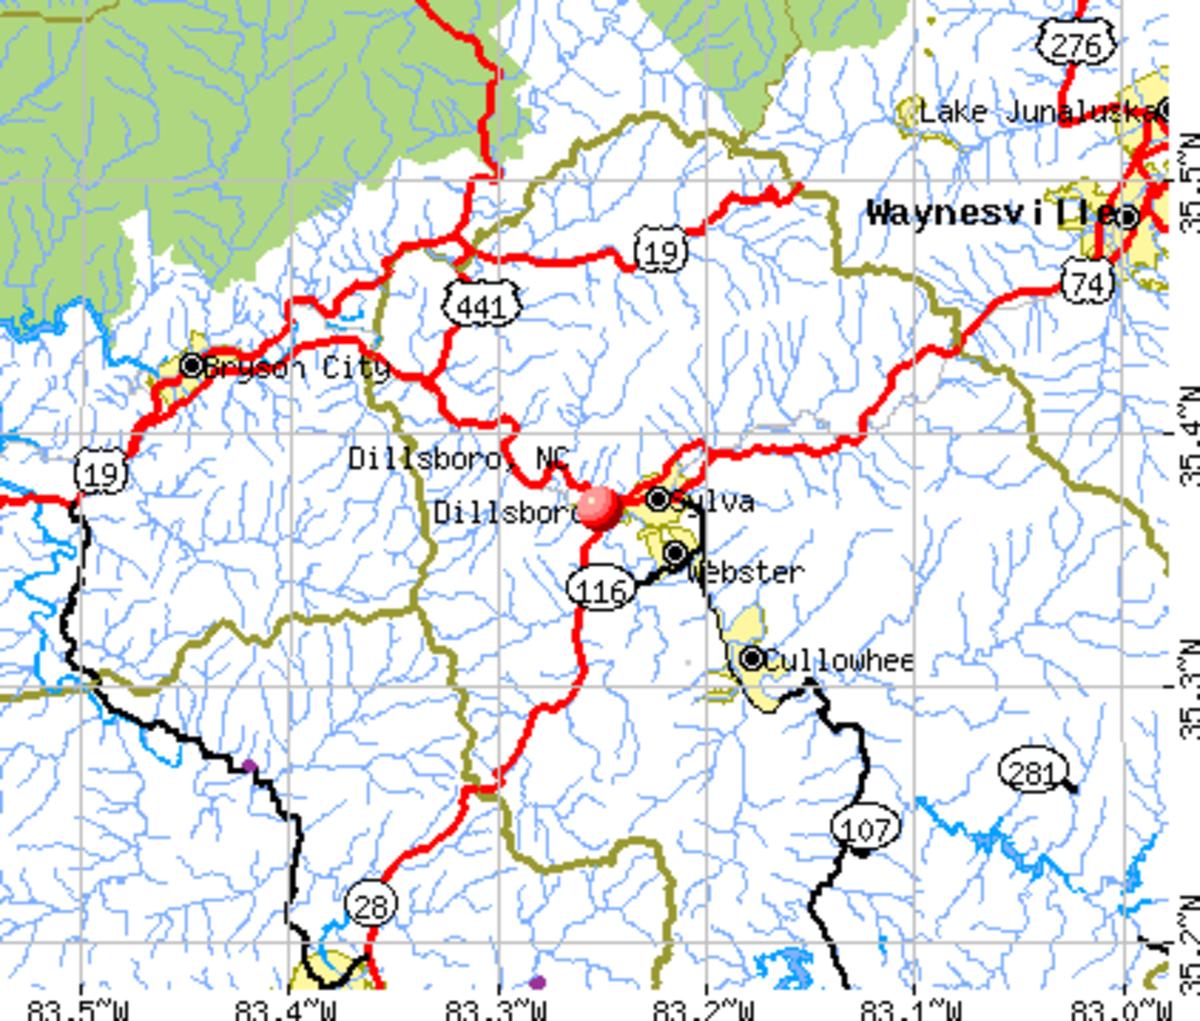 Map Of The Bryson City Dillsboro Area Where The Great Smoky Mountain Railroad Operates